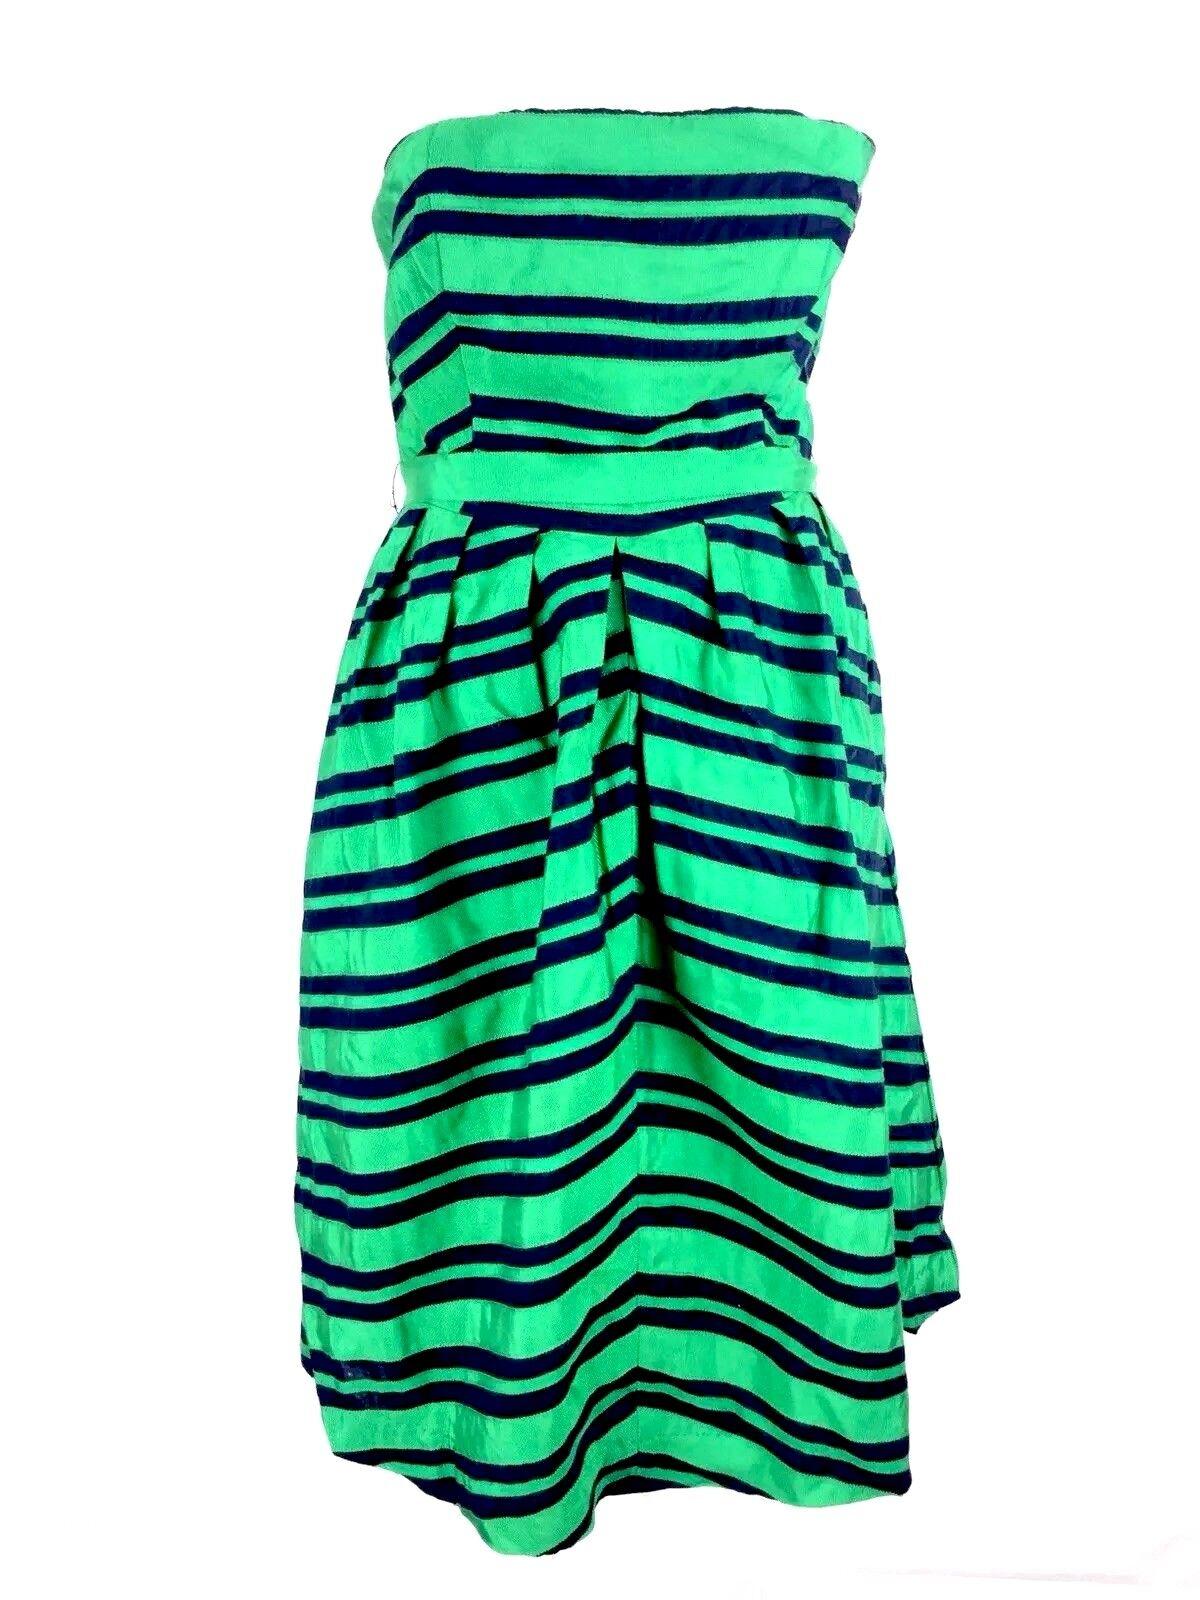 Moulinette Soeurs Womens Dress Sz 8 Fit To Flare Corset Green Striped Sleeveless